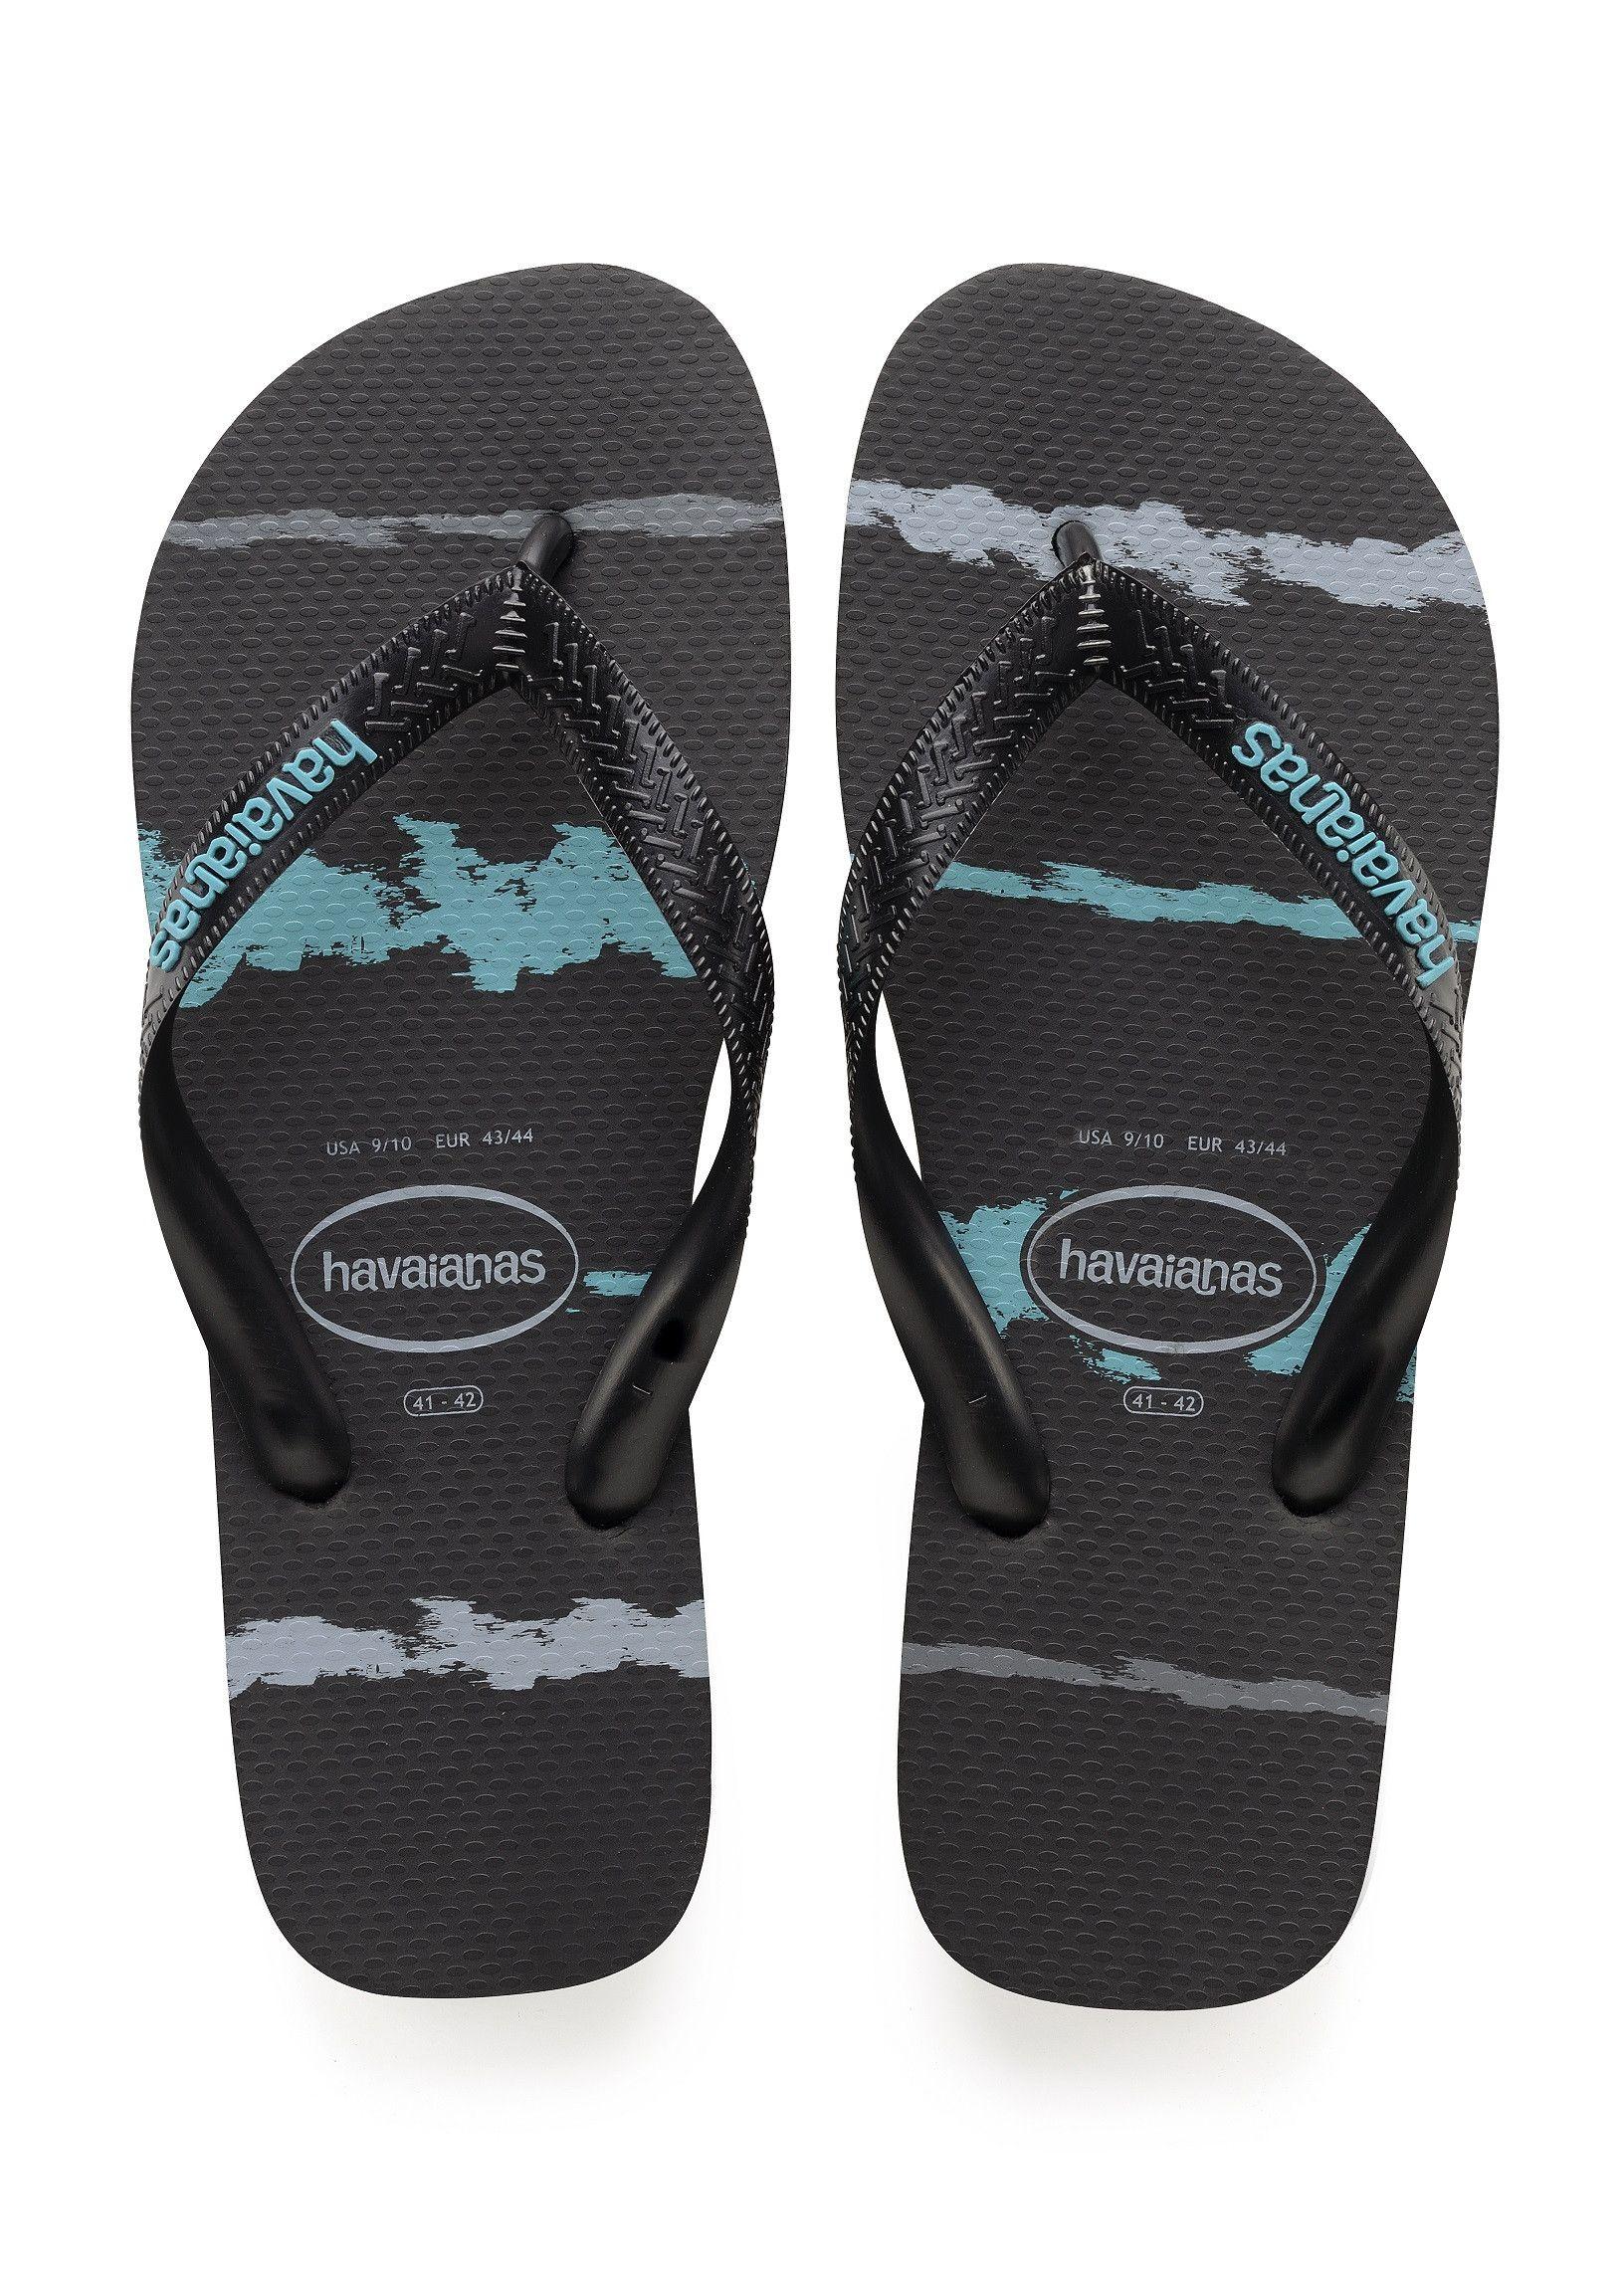 Havaianas Top Tropical Glitch Sandal Black Blue Price From 24 00 Https Www Flopstore Com Com English New Arrivals Black Sandals Havaianas Mens Flip Flops